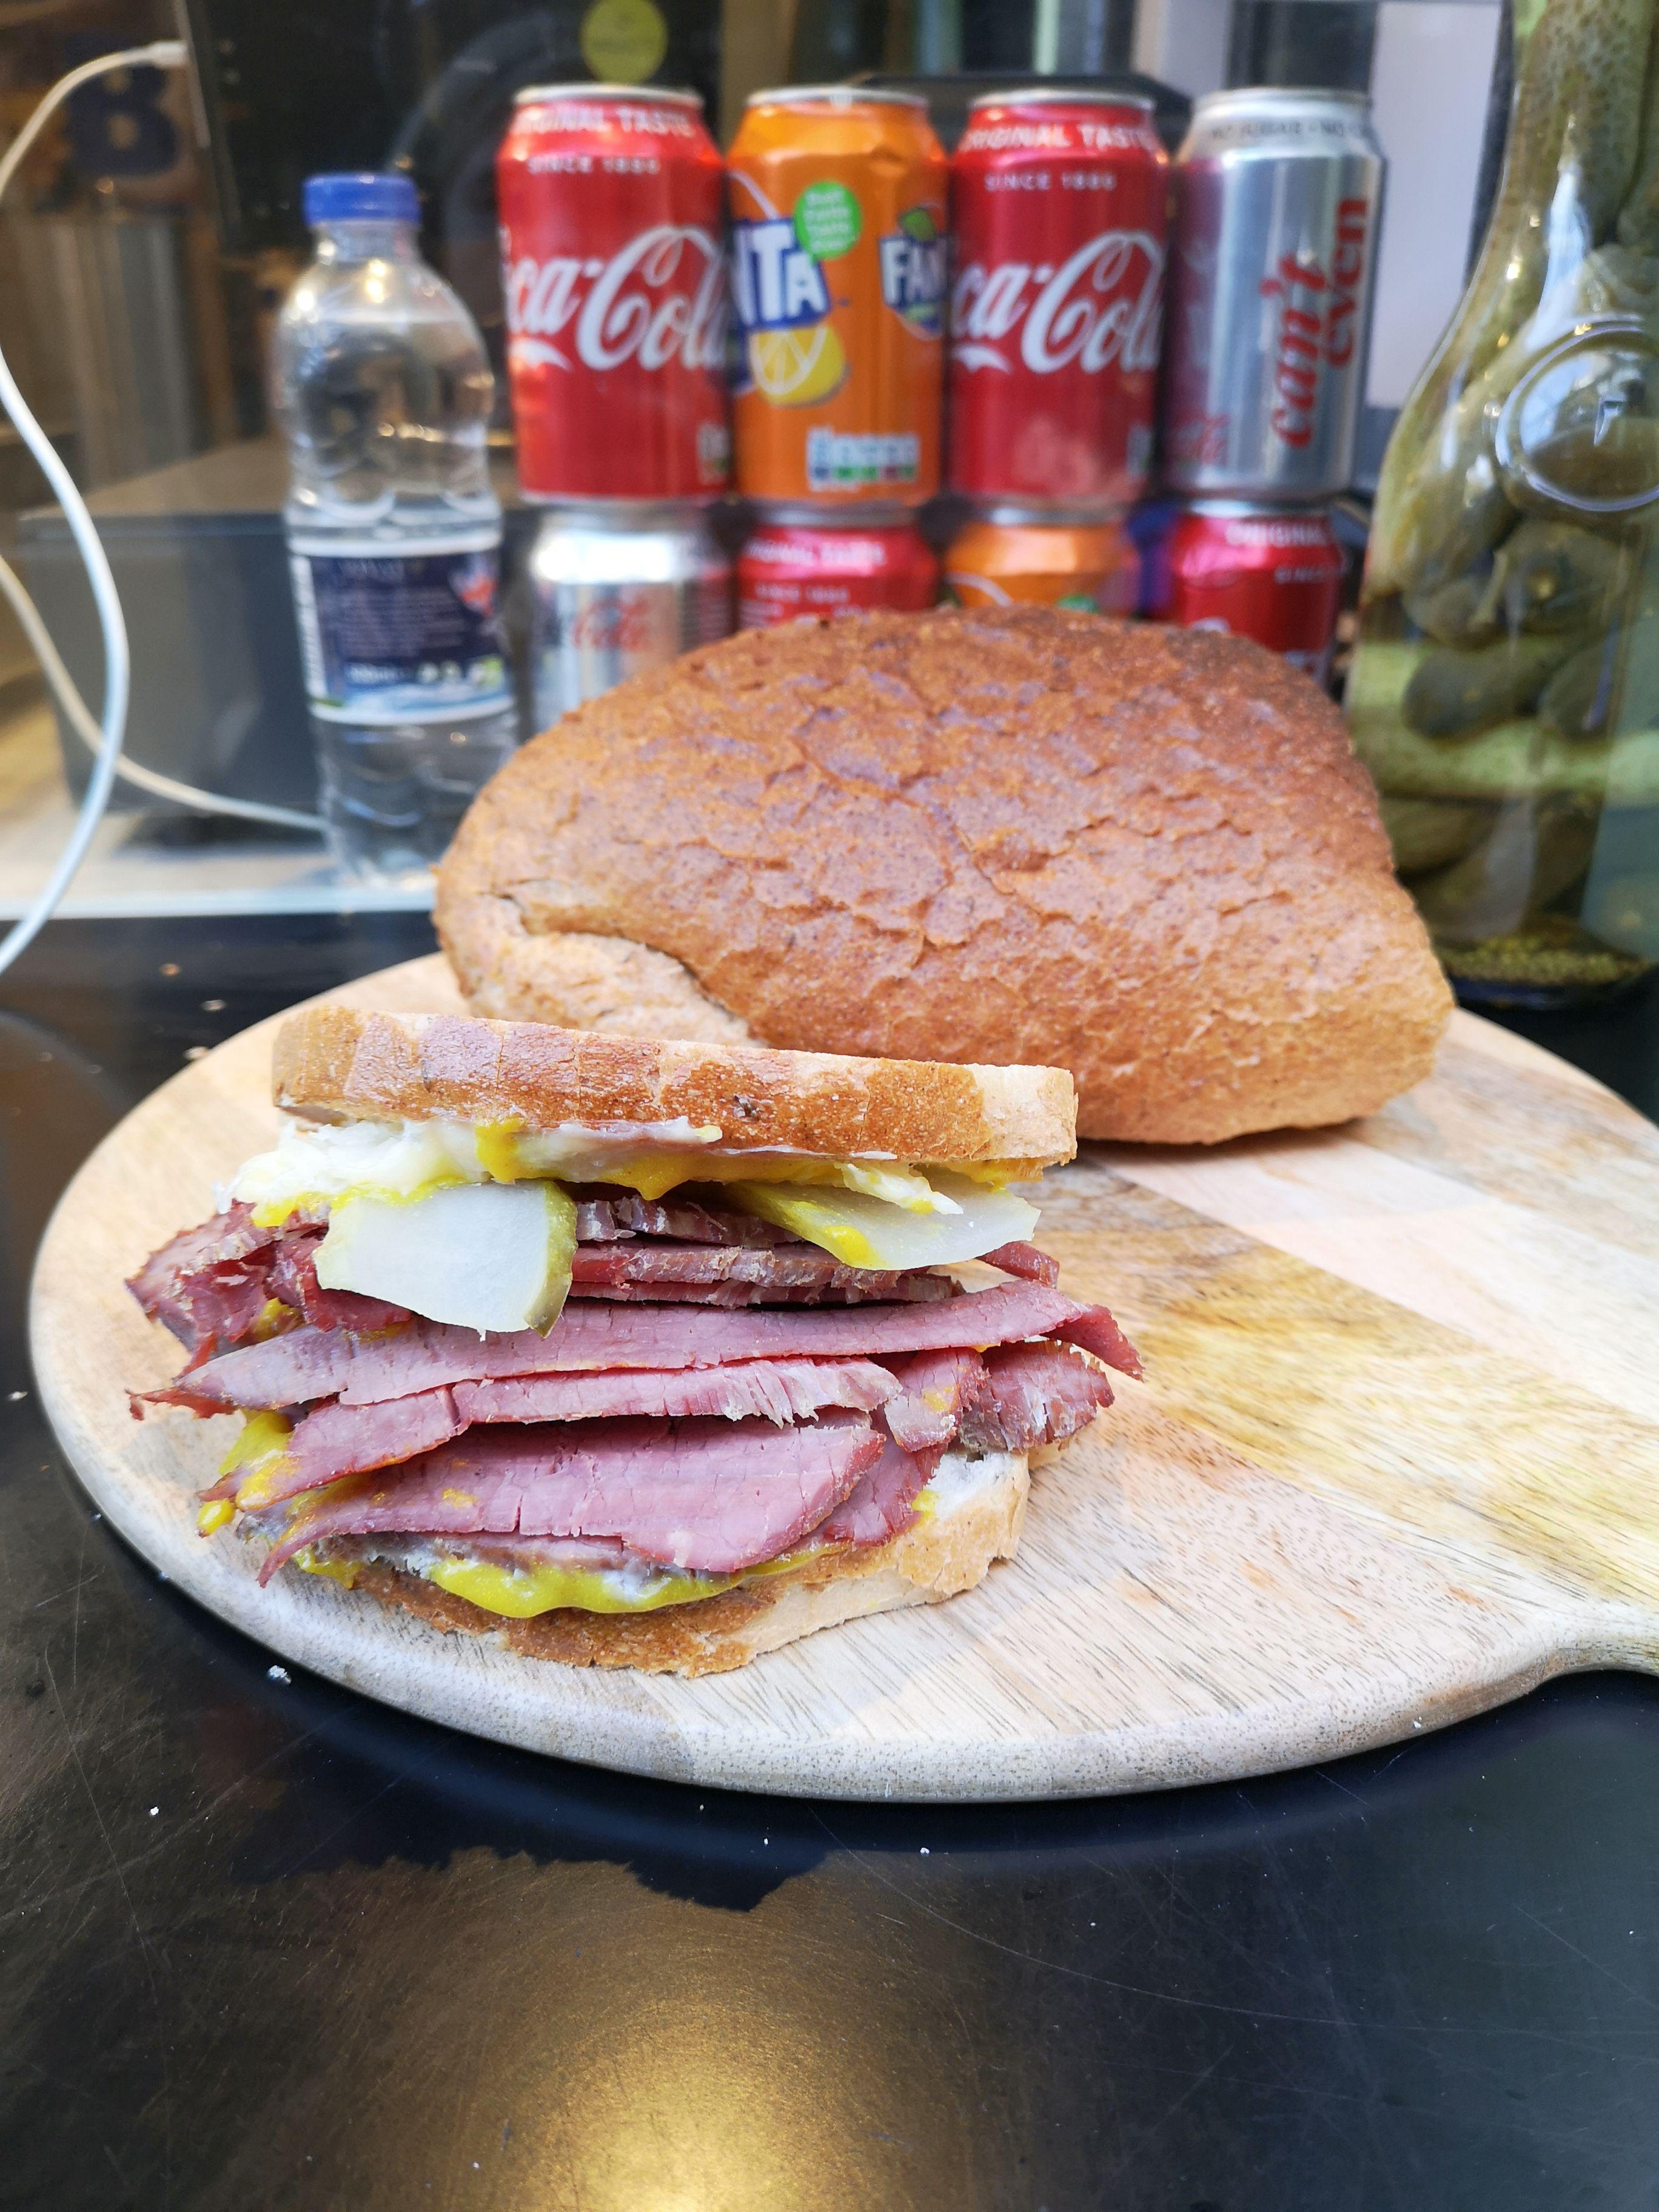 A classic Reuben sandwich.